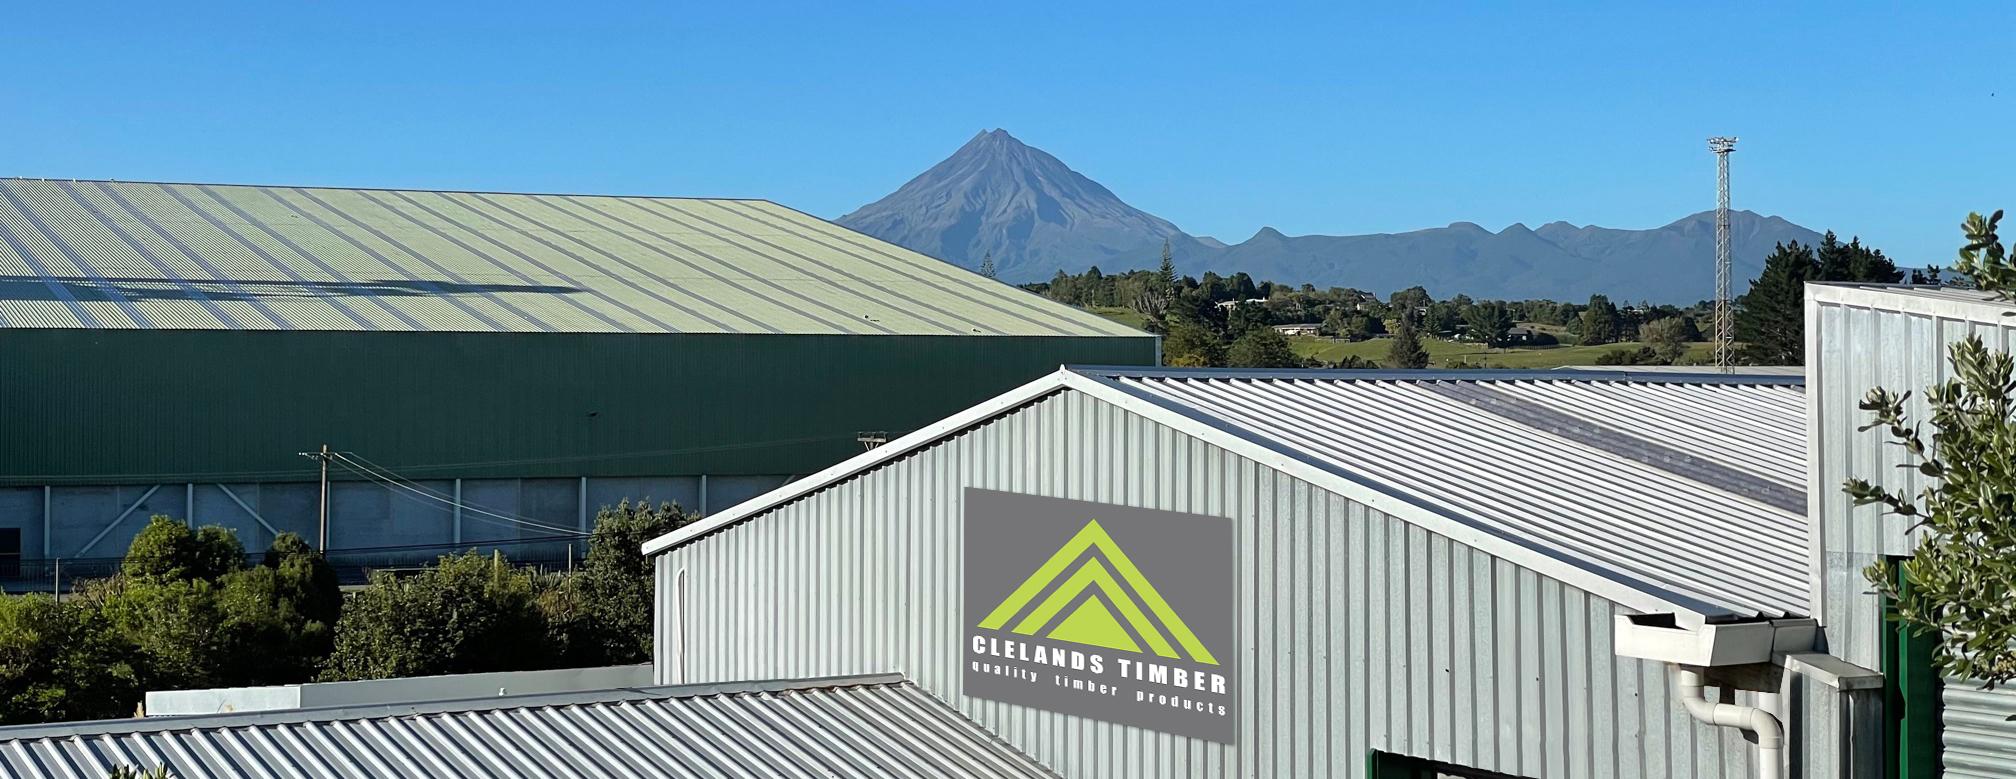 Clelands Timber New Zealand